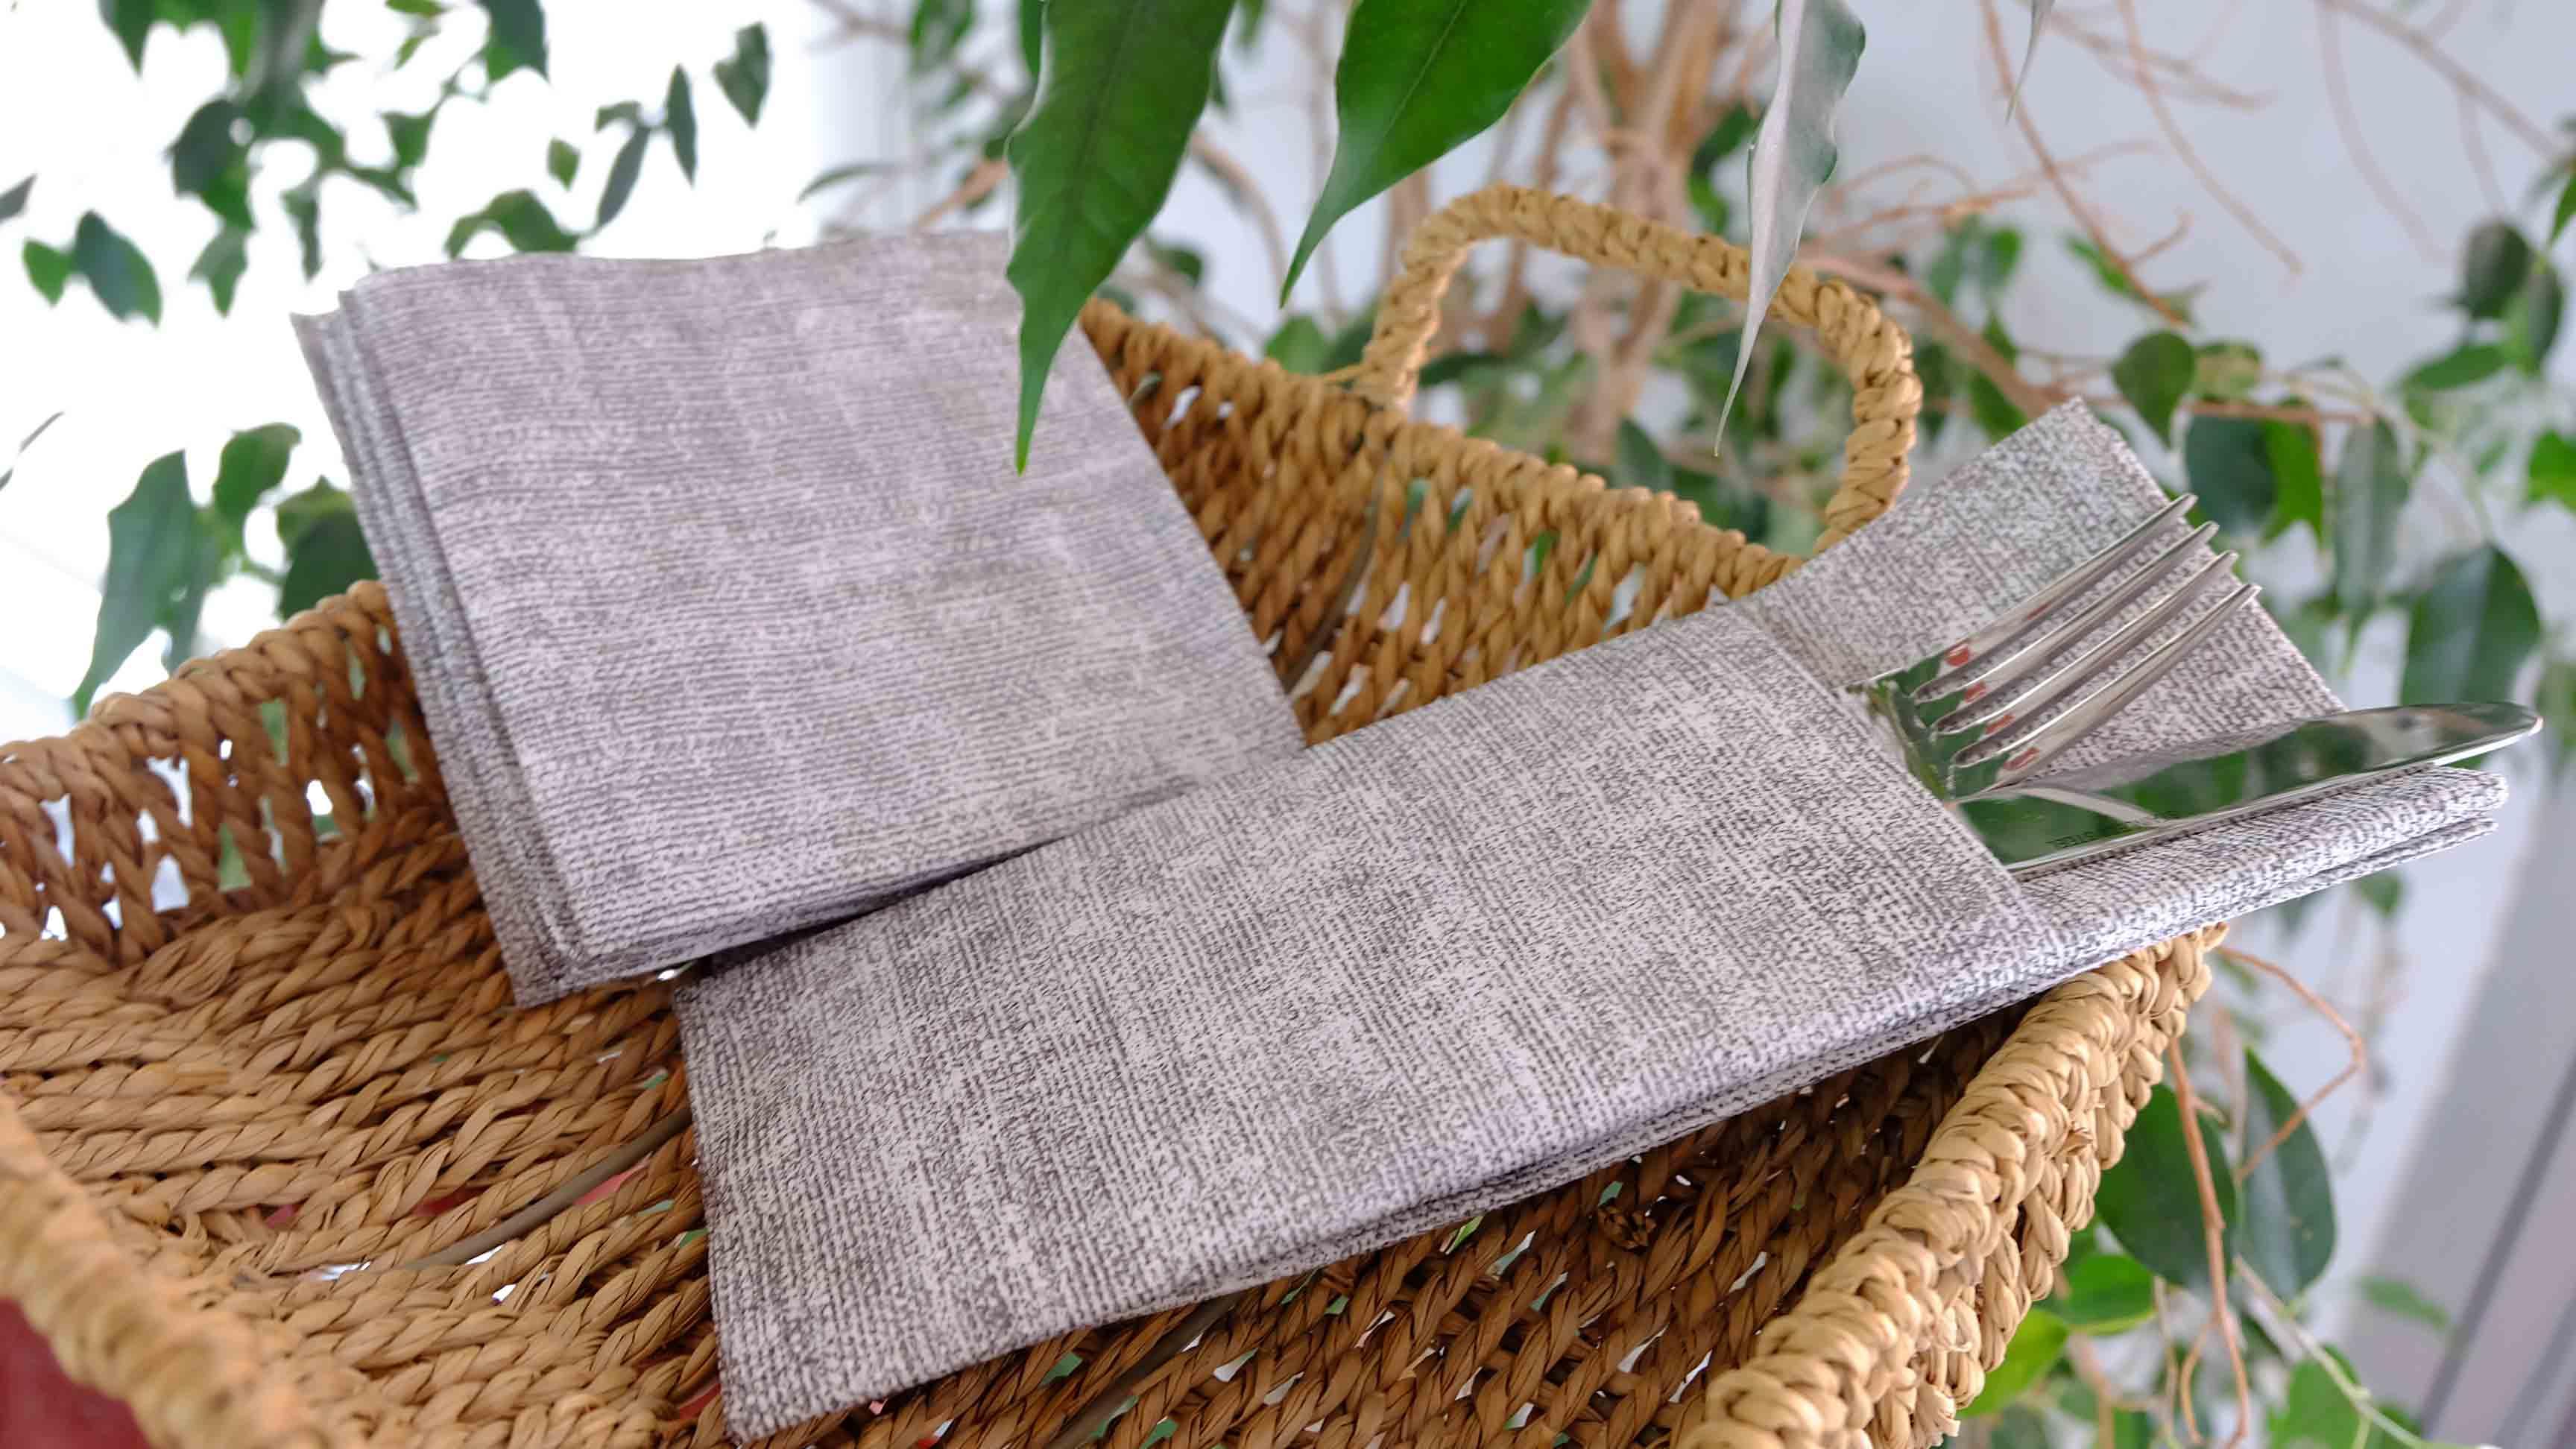 airlaid-servilletas-y manteles-biodegradables-sostenibles-la-pajarita